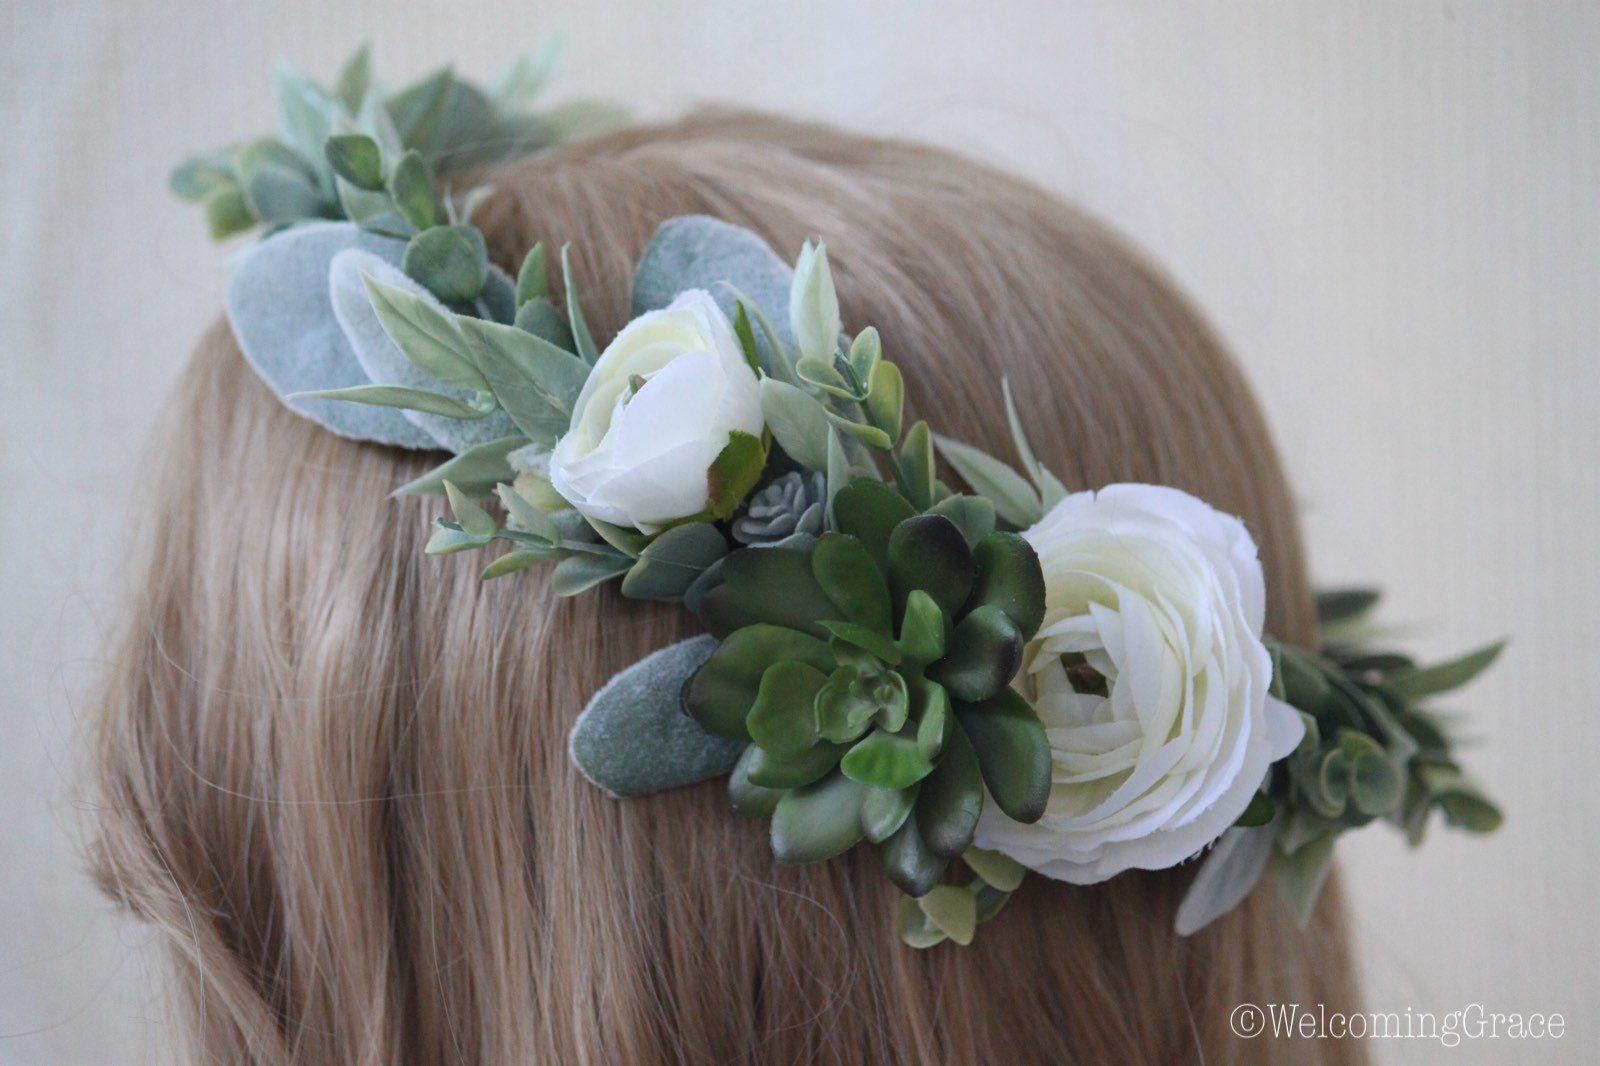 Succulent Flower Crown White Succulent Crown Ranunculus Flower Crown Wedding Bridal Floral Succulent Crown Flower Crown Wedding Flower Crown White Floral Crowns